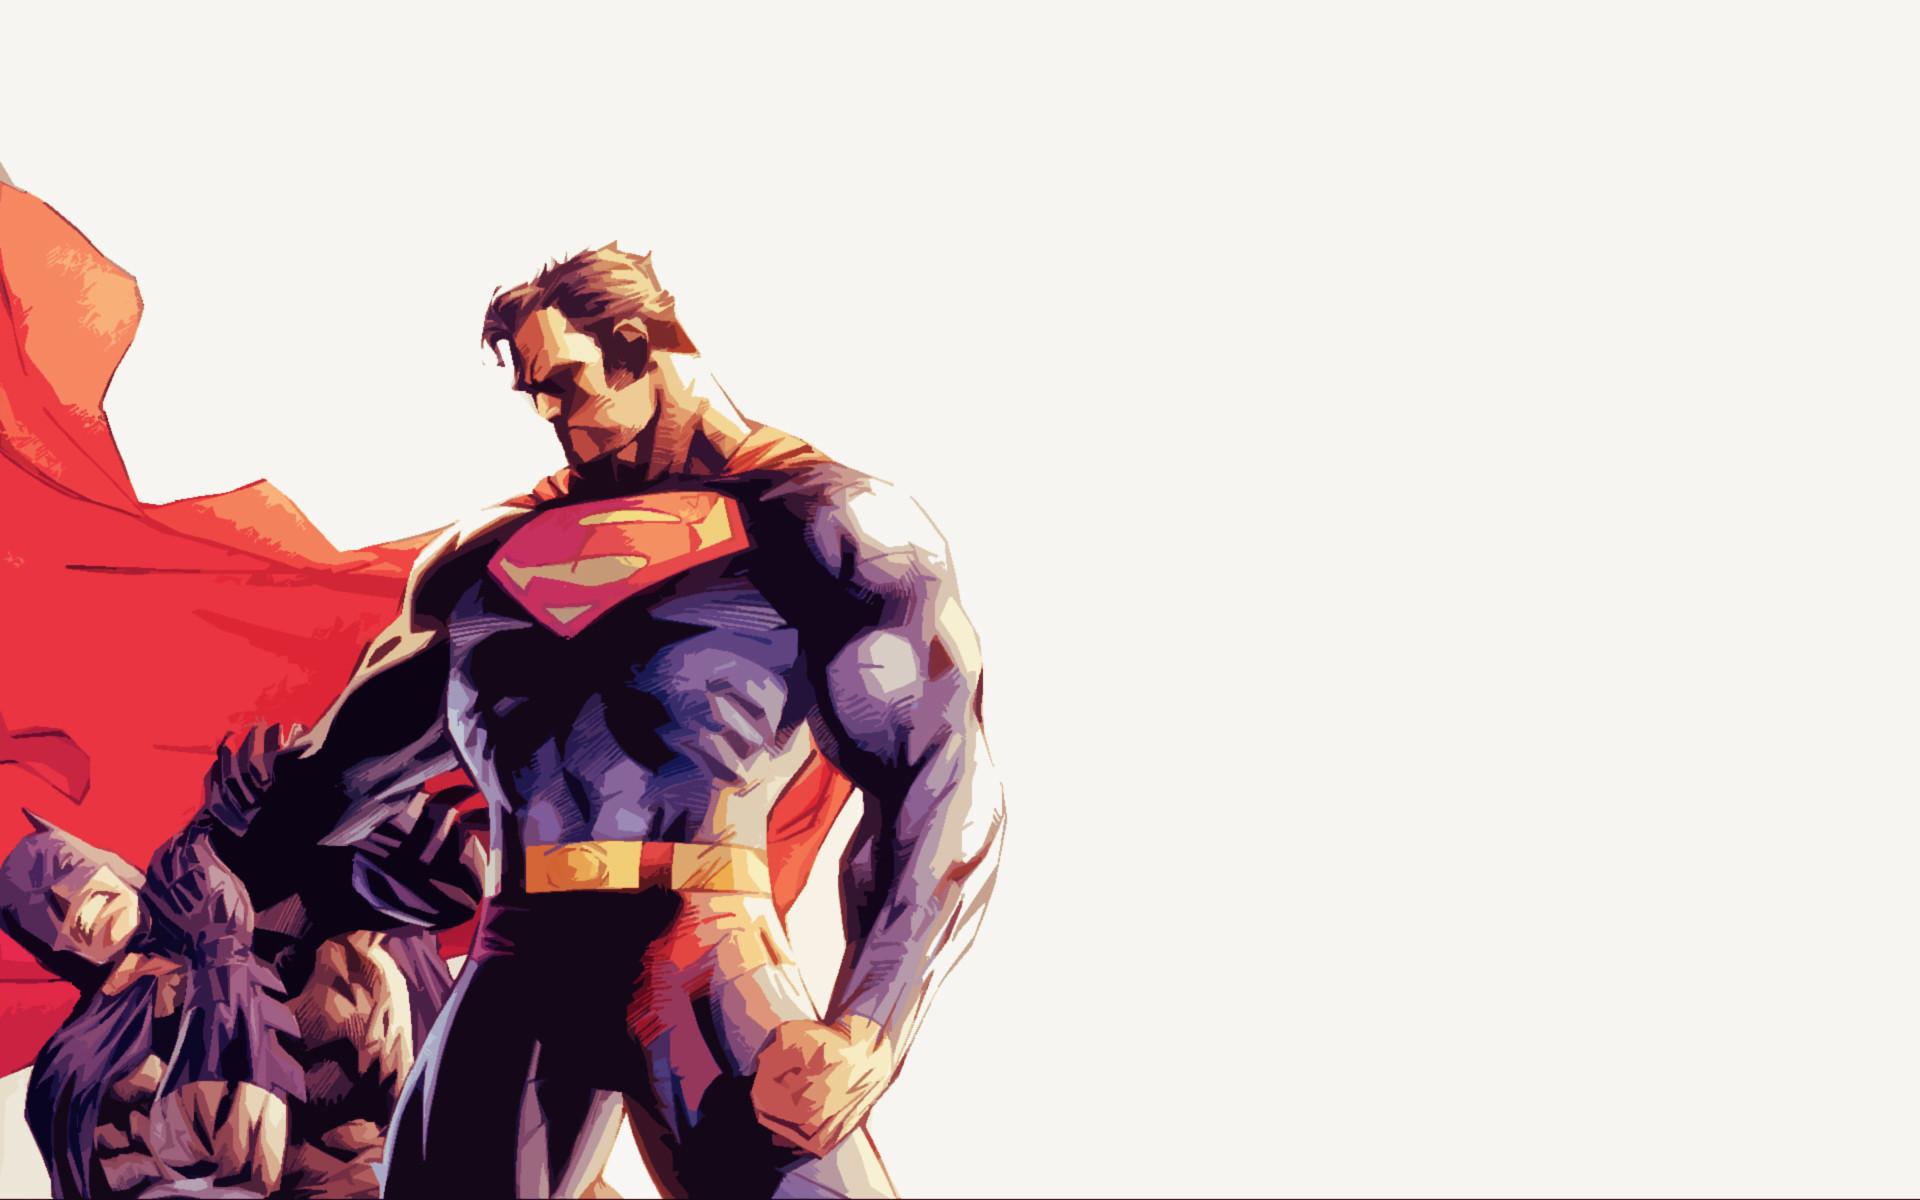 Superman Wallpaper 1080p Similar wallpapers. superman